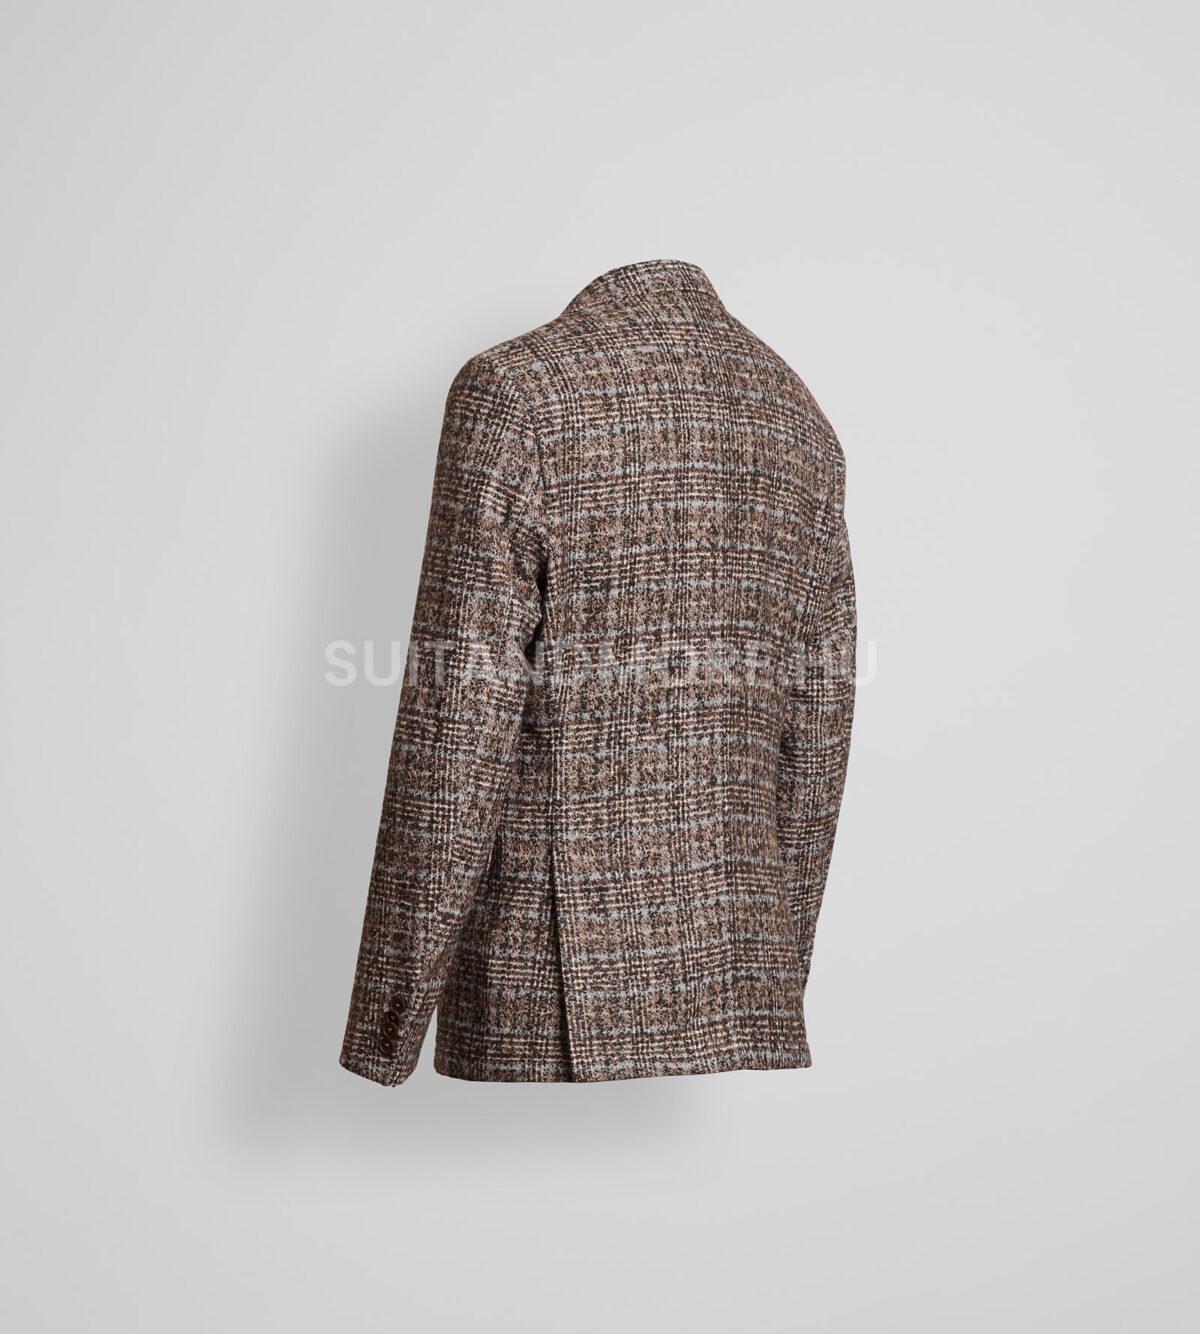 digel-mogyorobarna-slim-fit-gyapju-kevert-kockas-jersey-zako-kristo-1202478-35-01